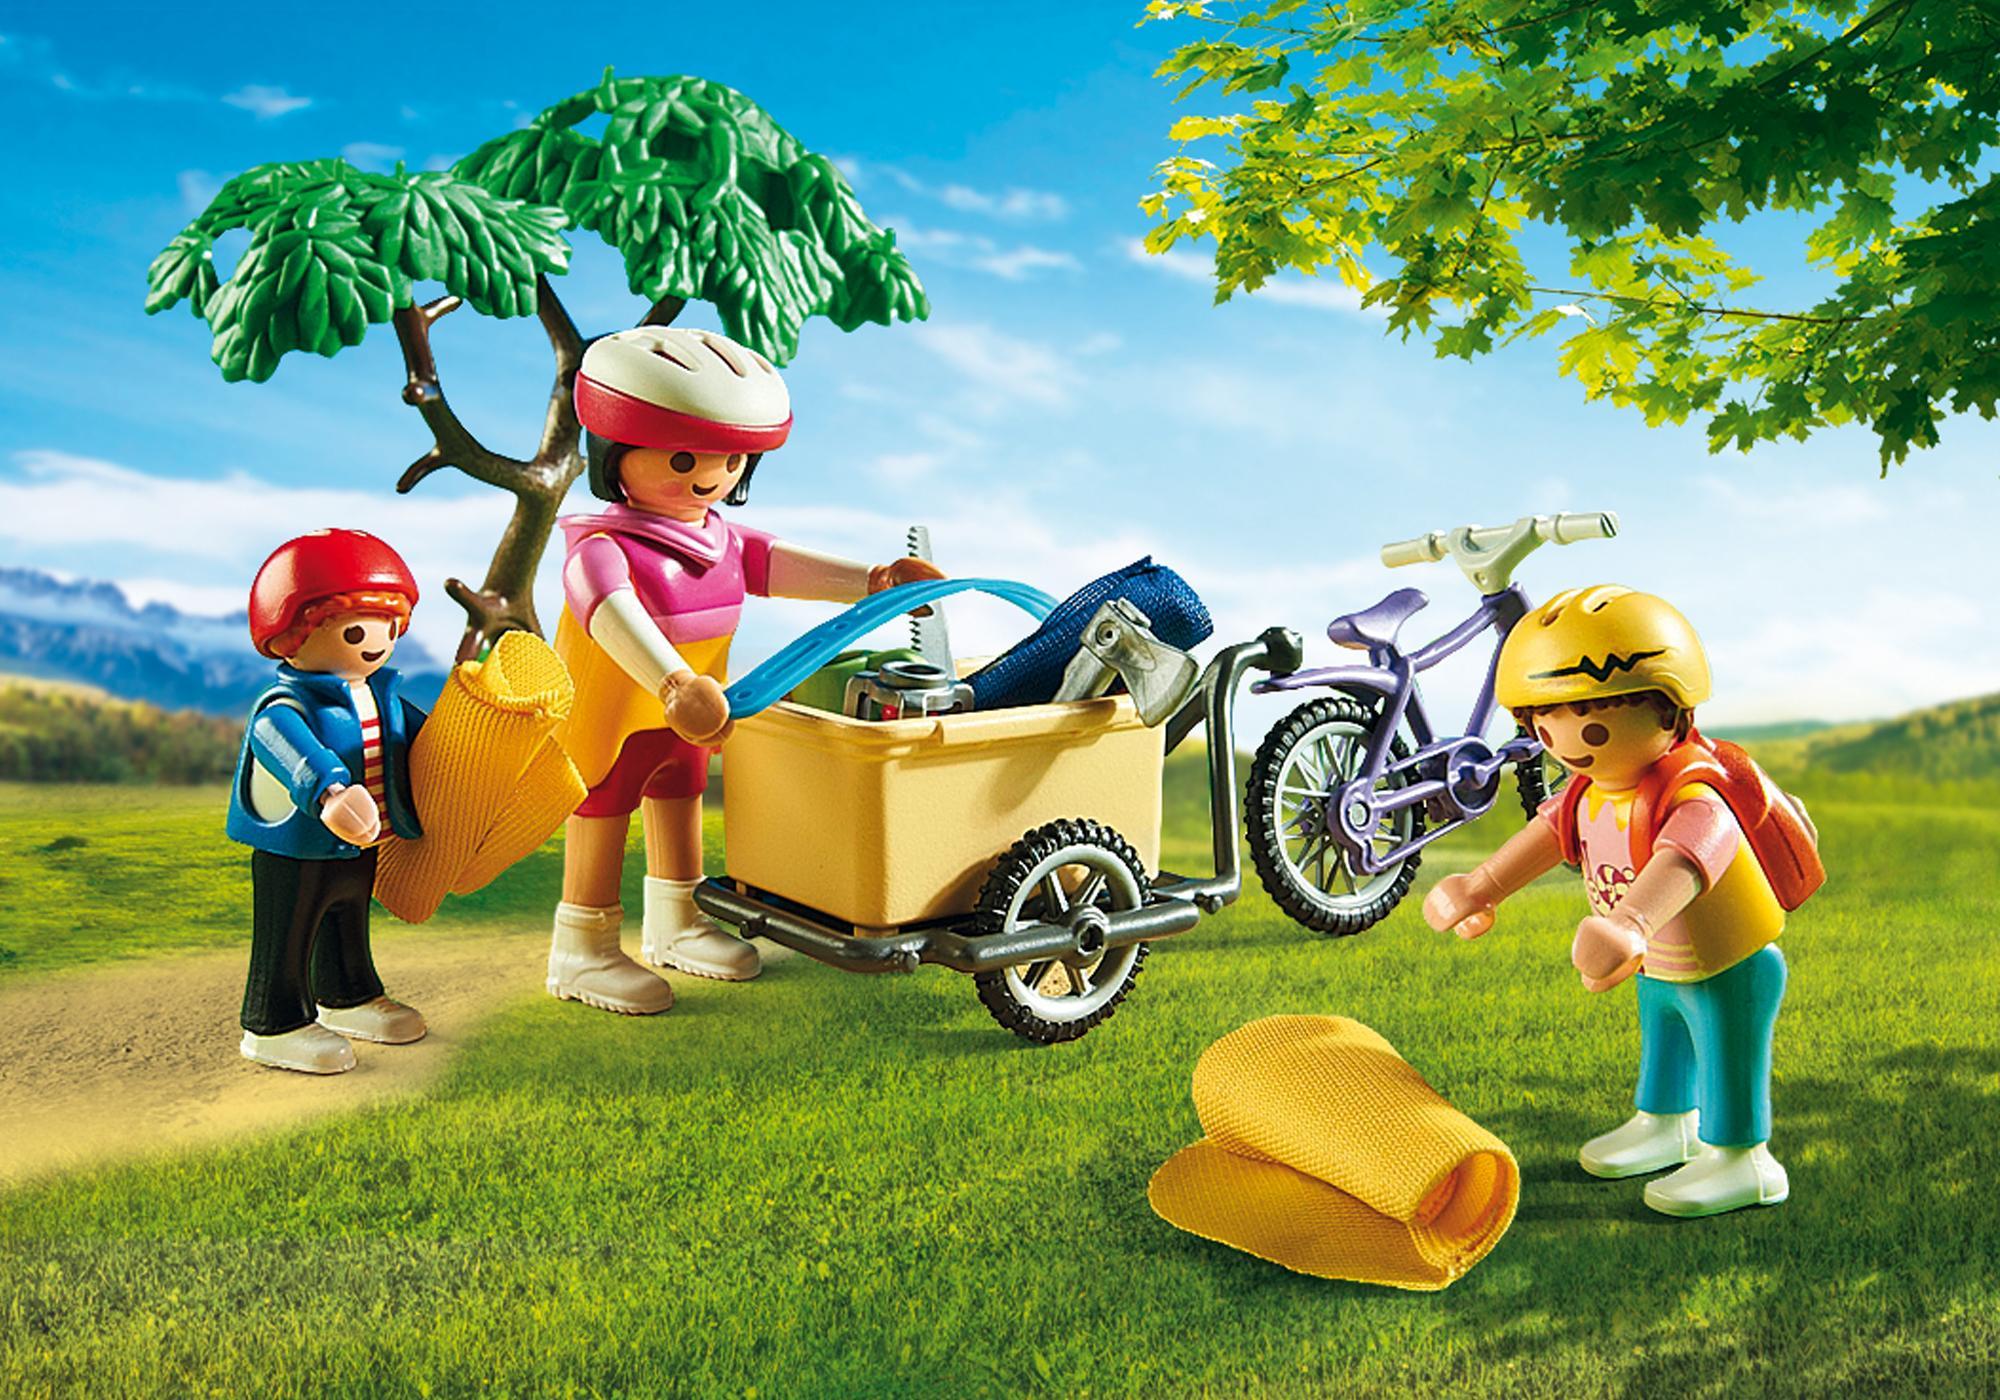 http://media.playmobil.com/i/playmobil/6890_product_extra2